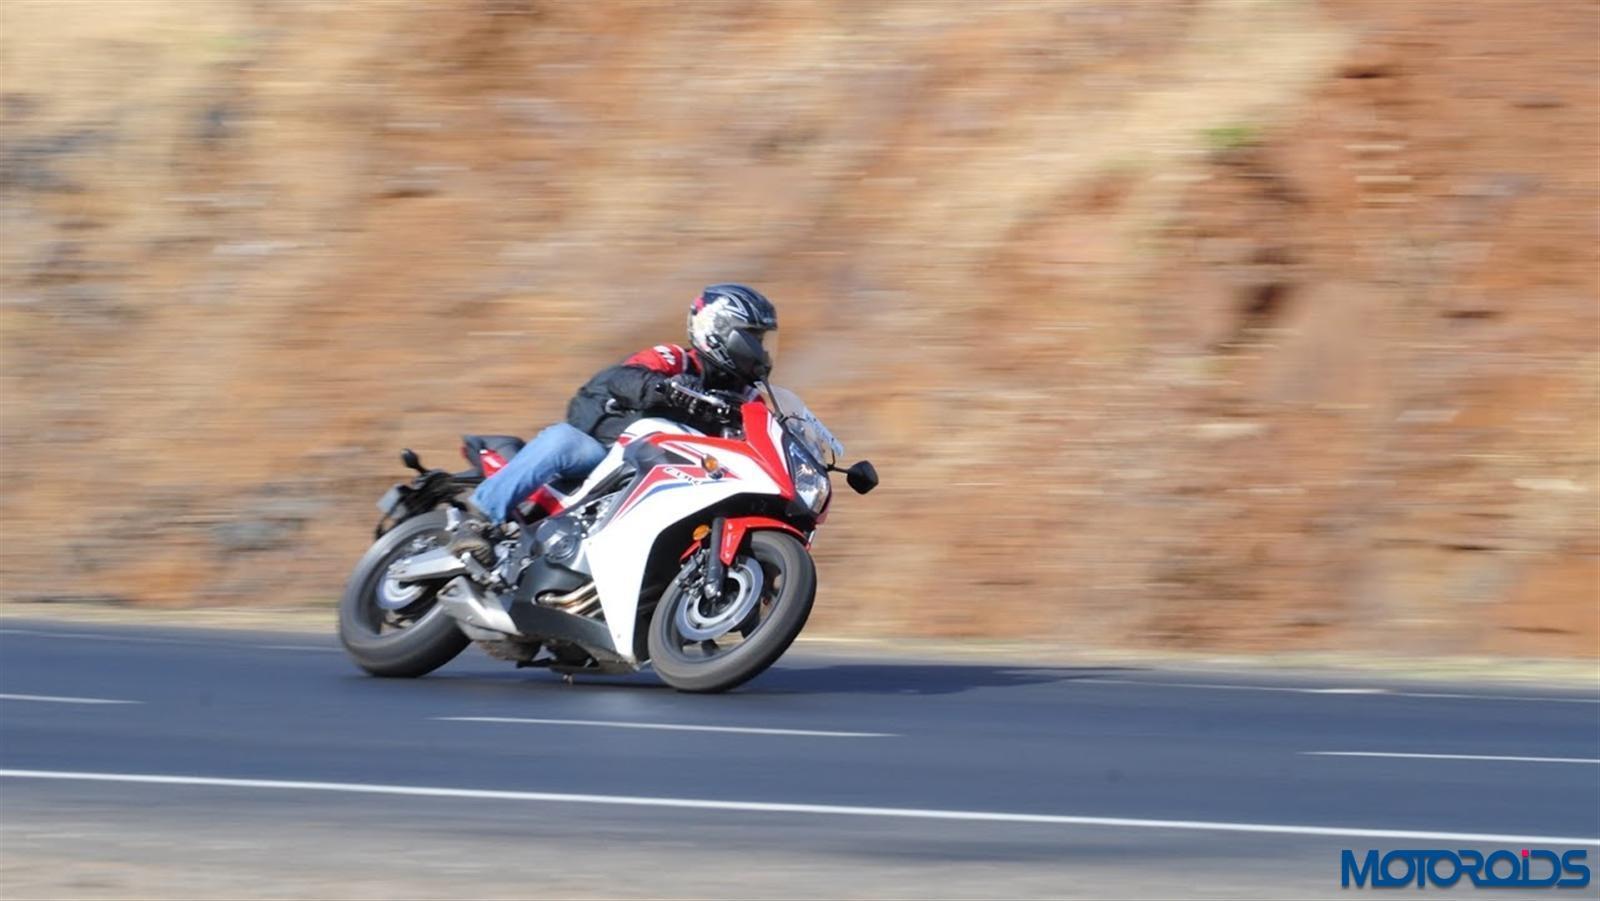 Honda CBR650F India (17)